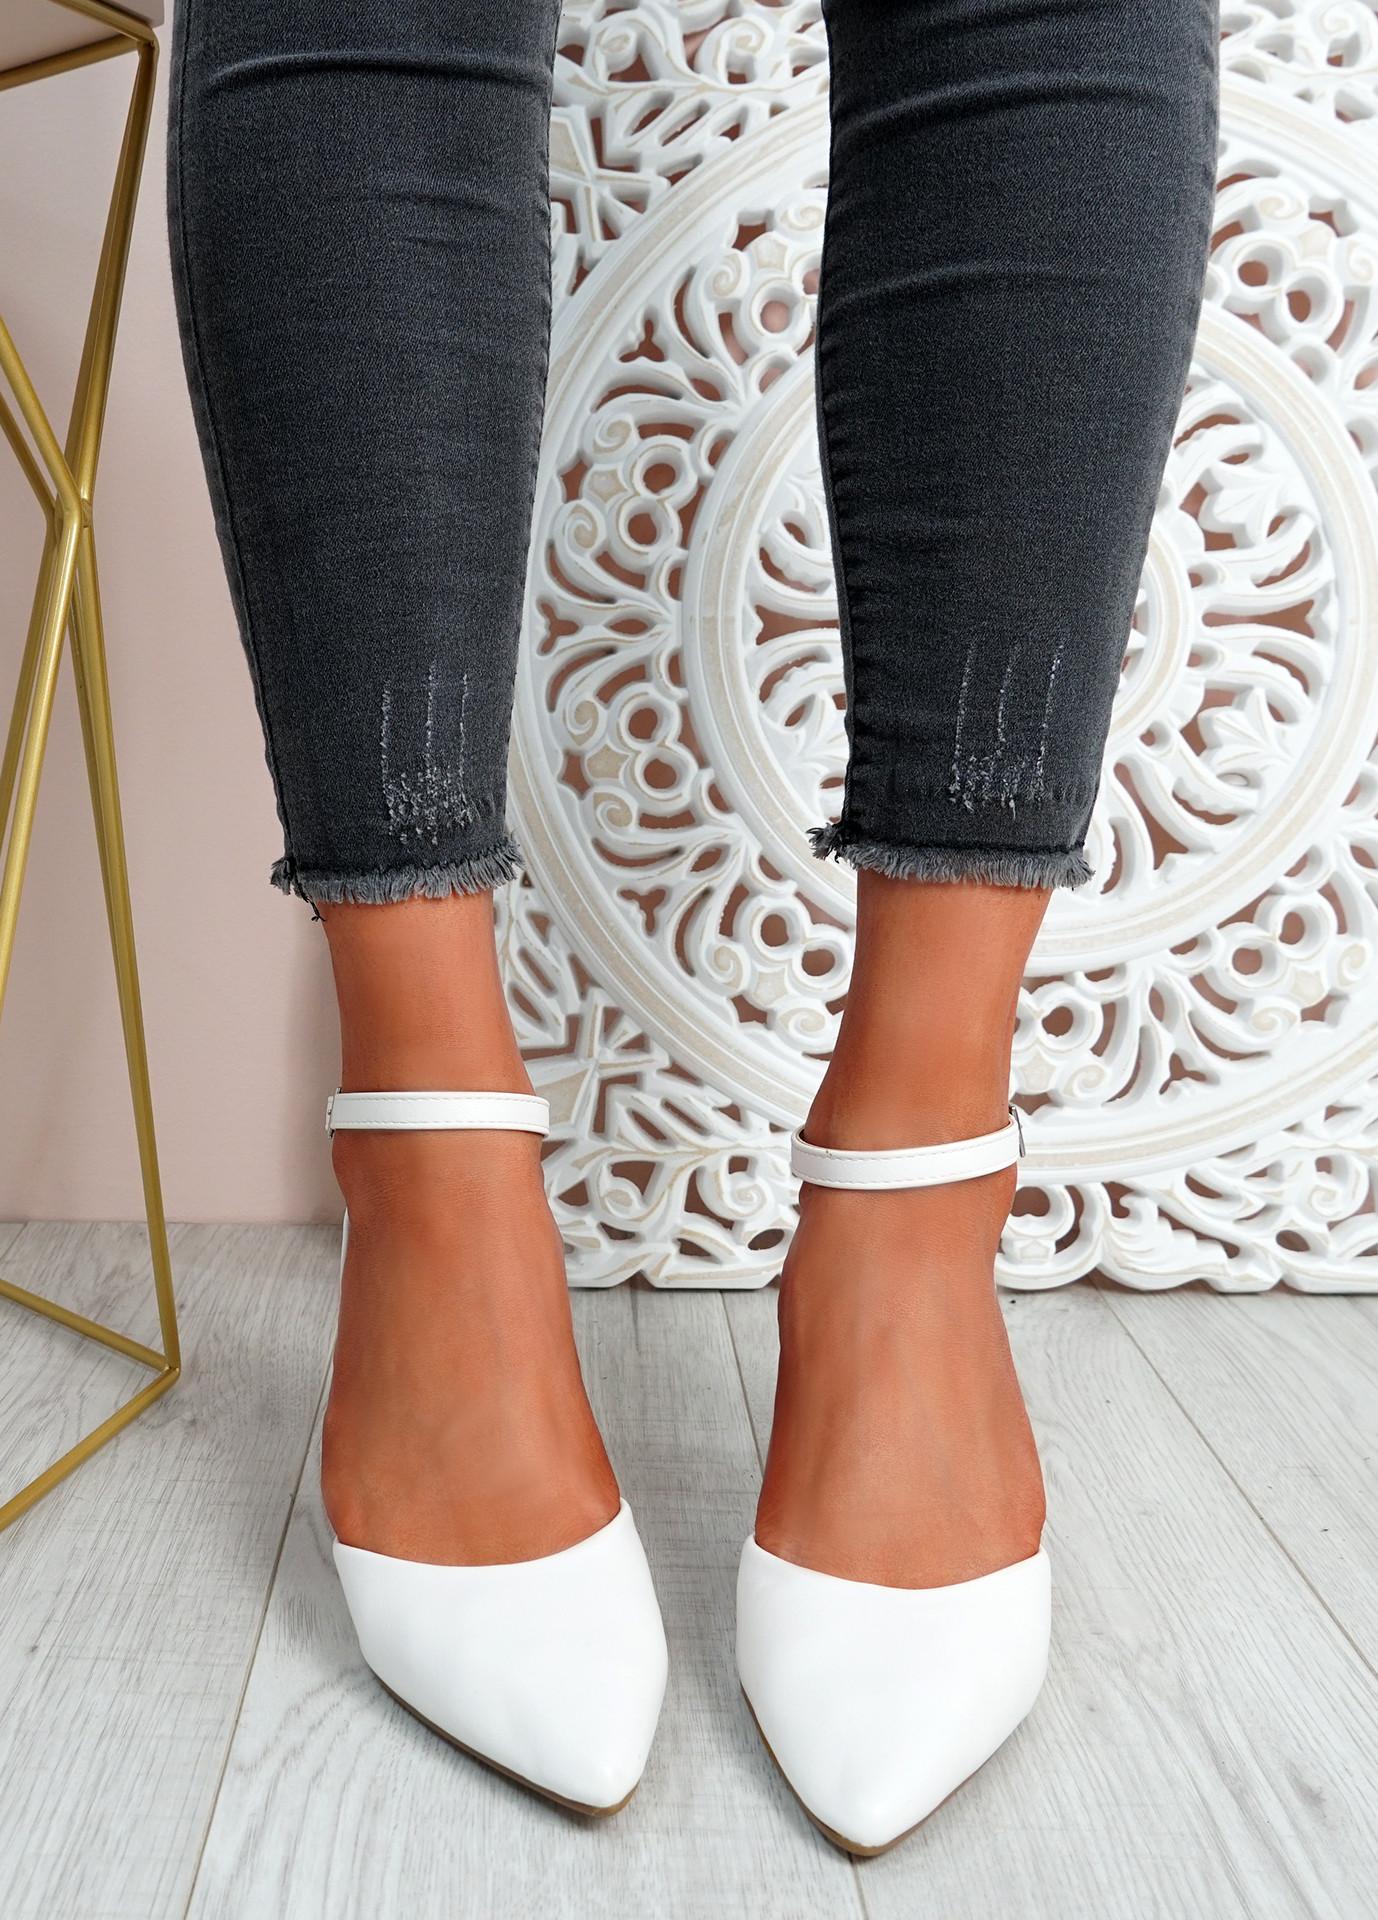 Mya White Block Heel Ankle Strap Pumps